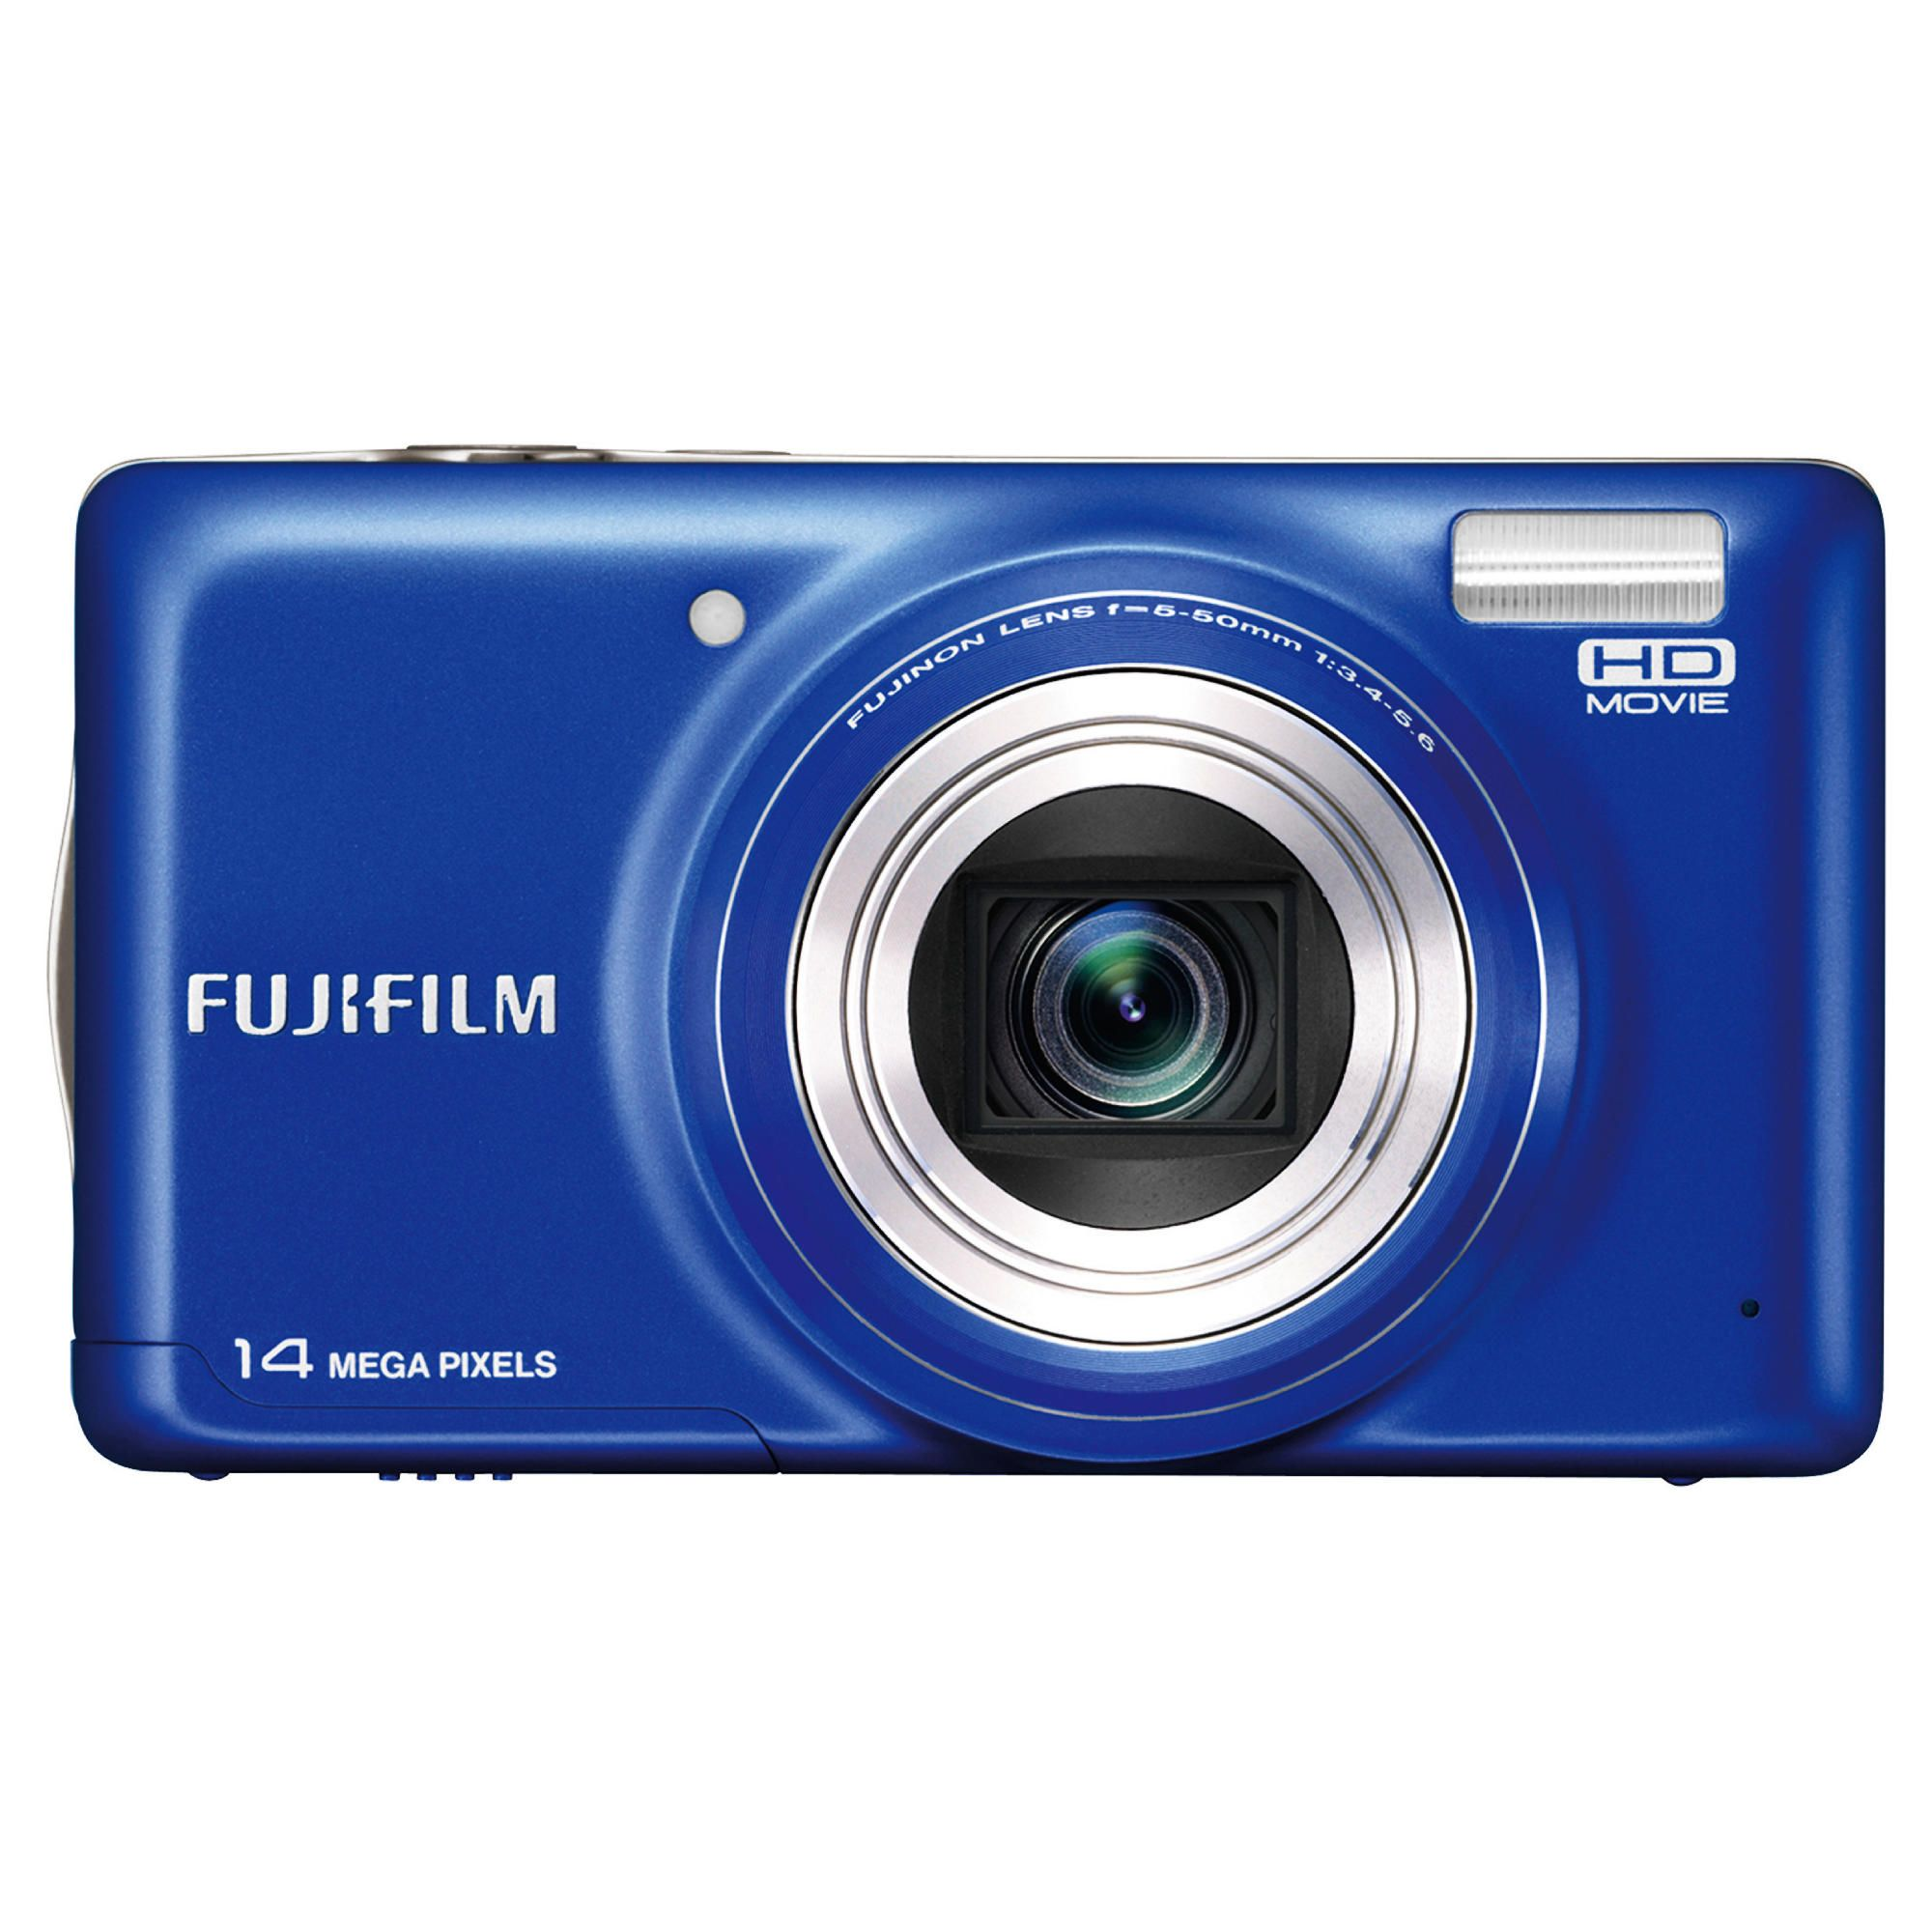 Fujifilm FinePix T350 Digital Camera, Blue, 14MP, 10x Optical Zoom, 3.0 inch LCD Screen